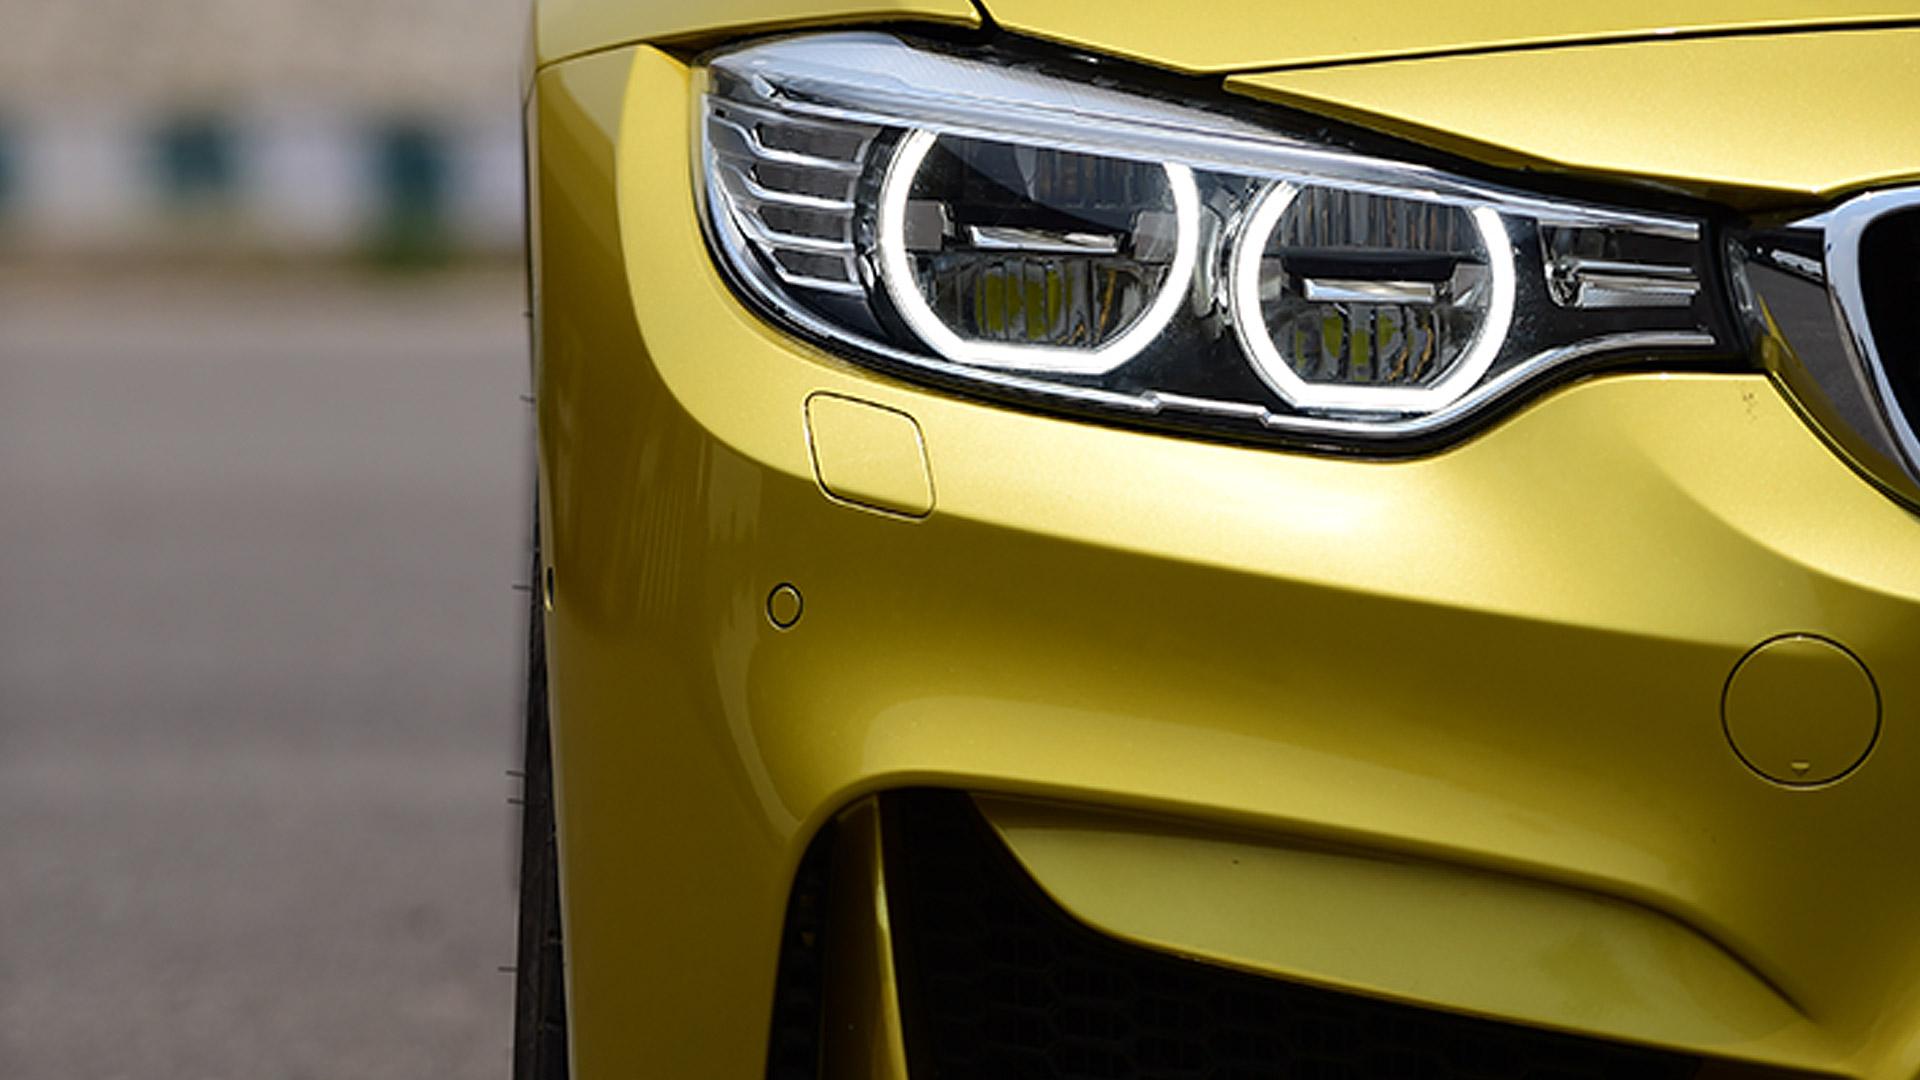 BMW M4 Coupe 2015 STD Exterior